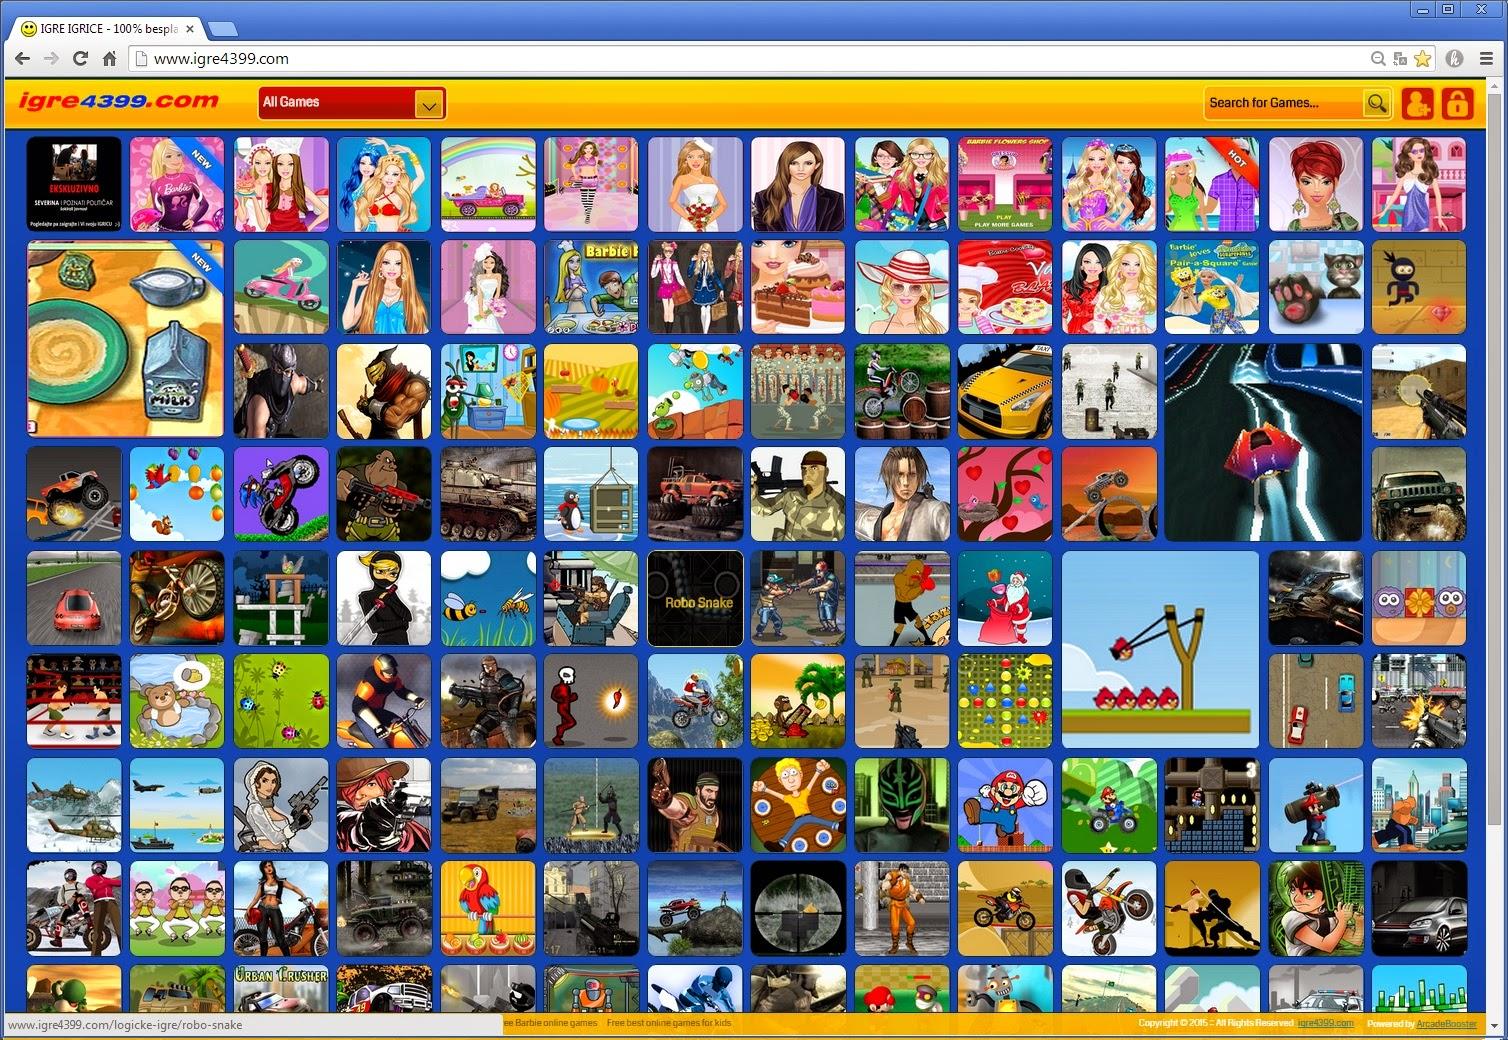 sidney sheldon free ebooks download pdf